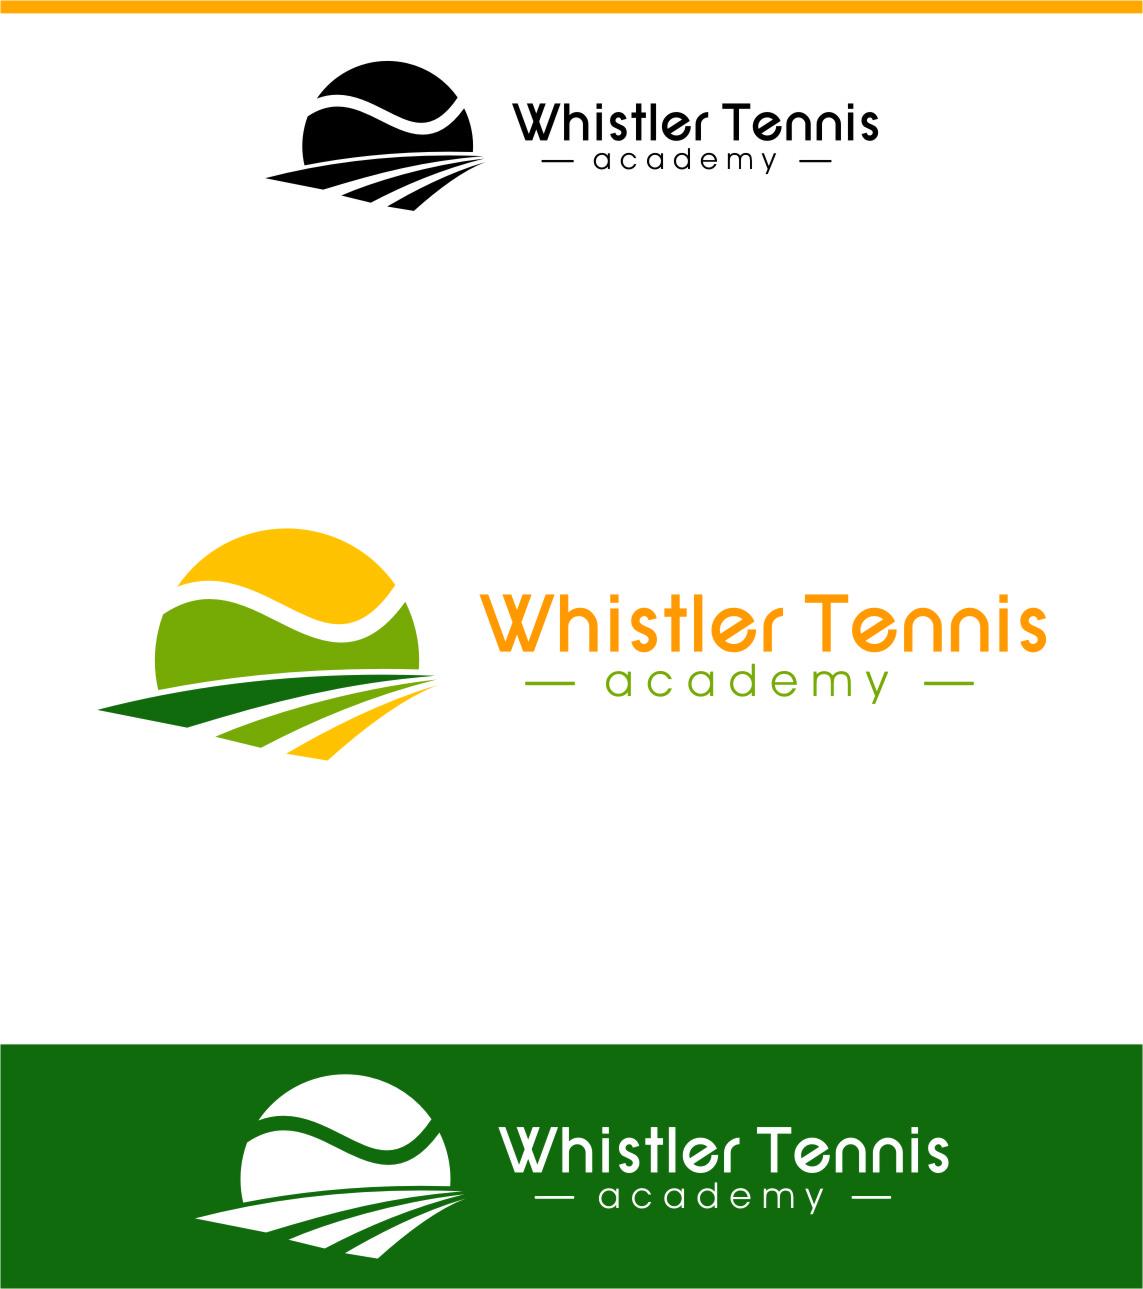 Logo Design by Ngepet_art - Entry No. 101 in the Logo Design Contest Imaginative Logo Design for Whistler Tennis Academy.